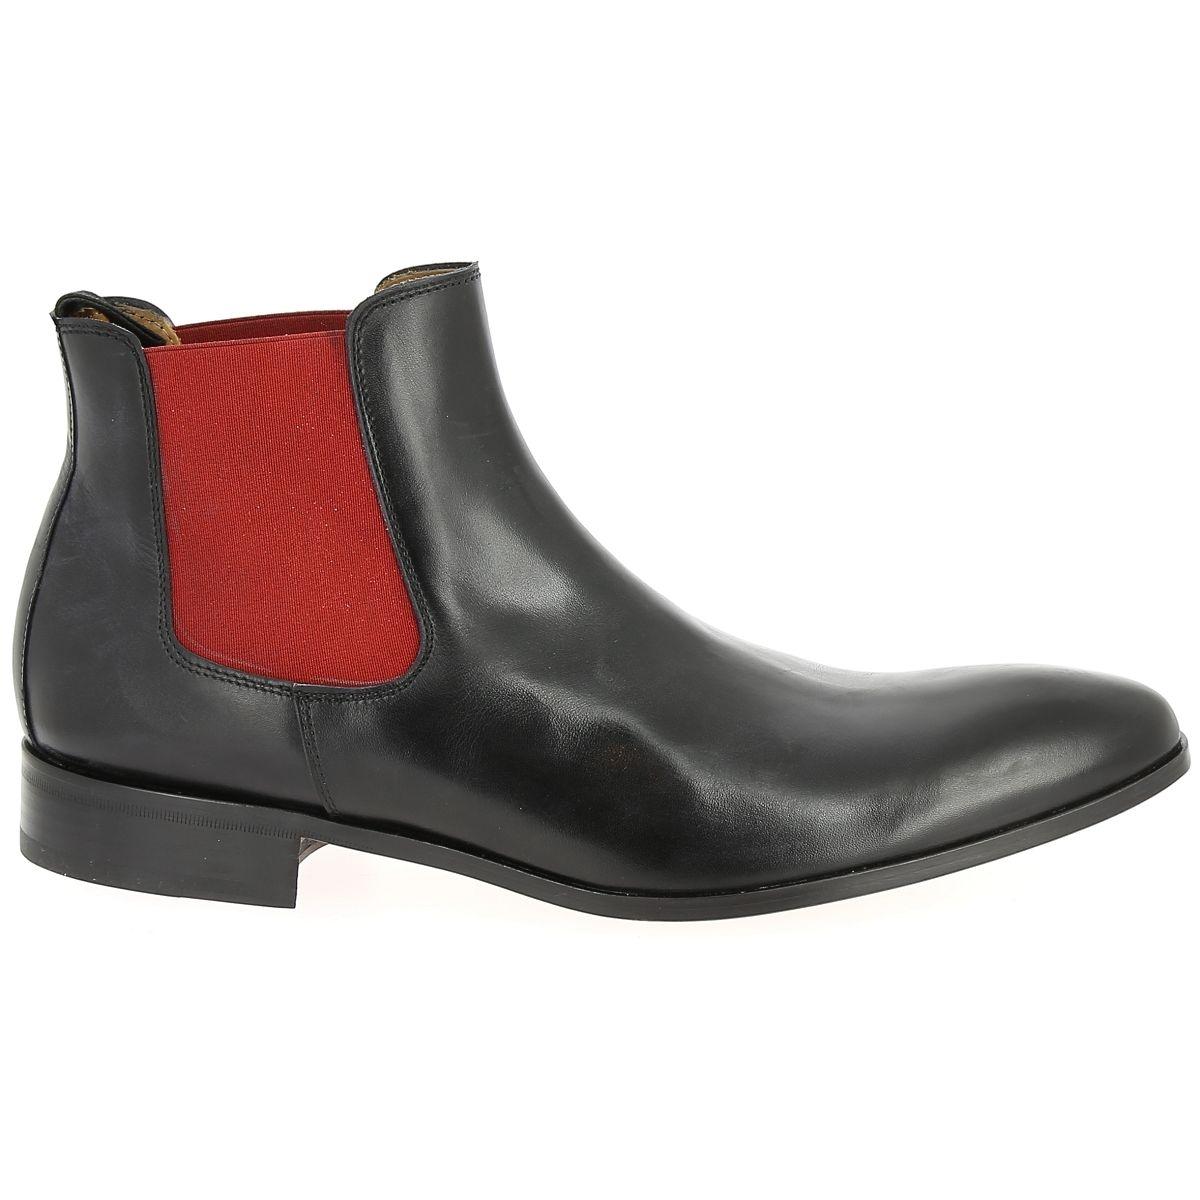 Boots Cuir 325 145